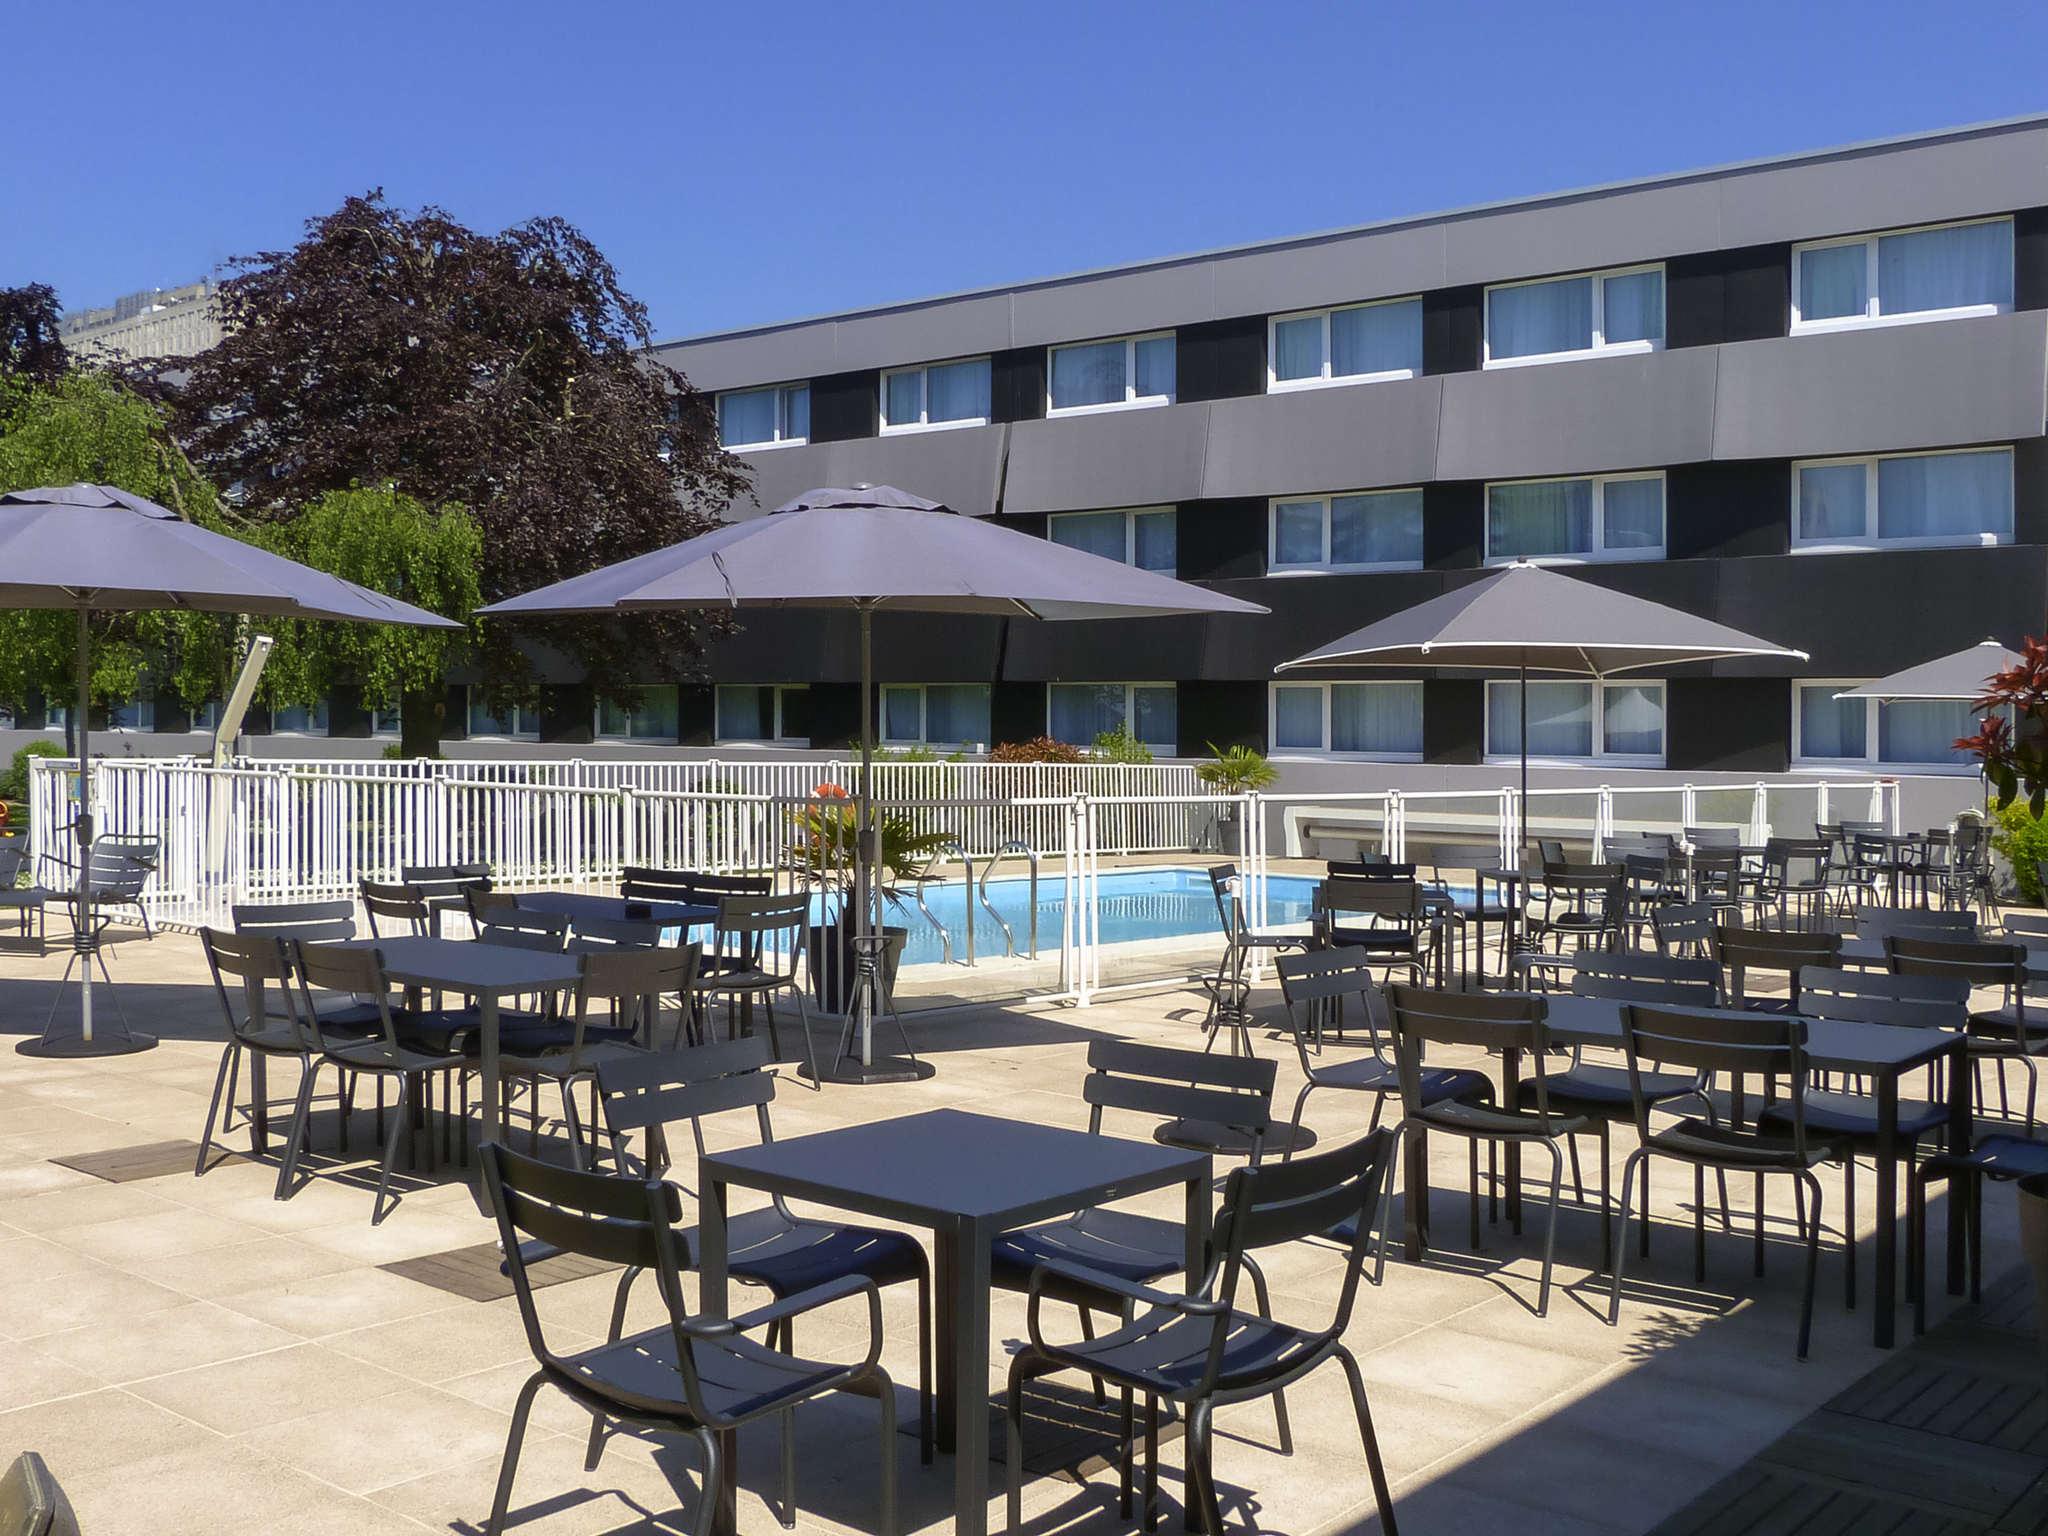 Hotel – Novotel Caen Côte de Nacre